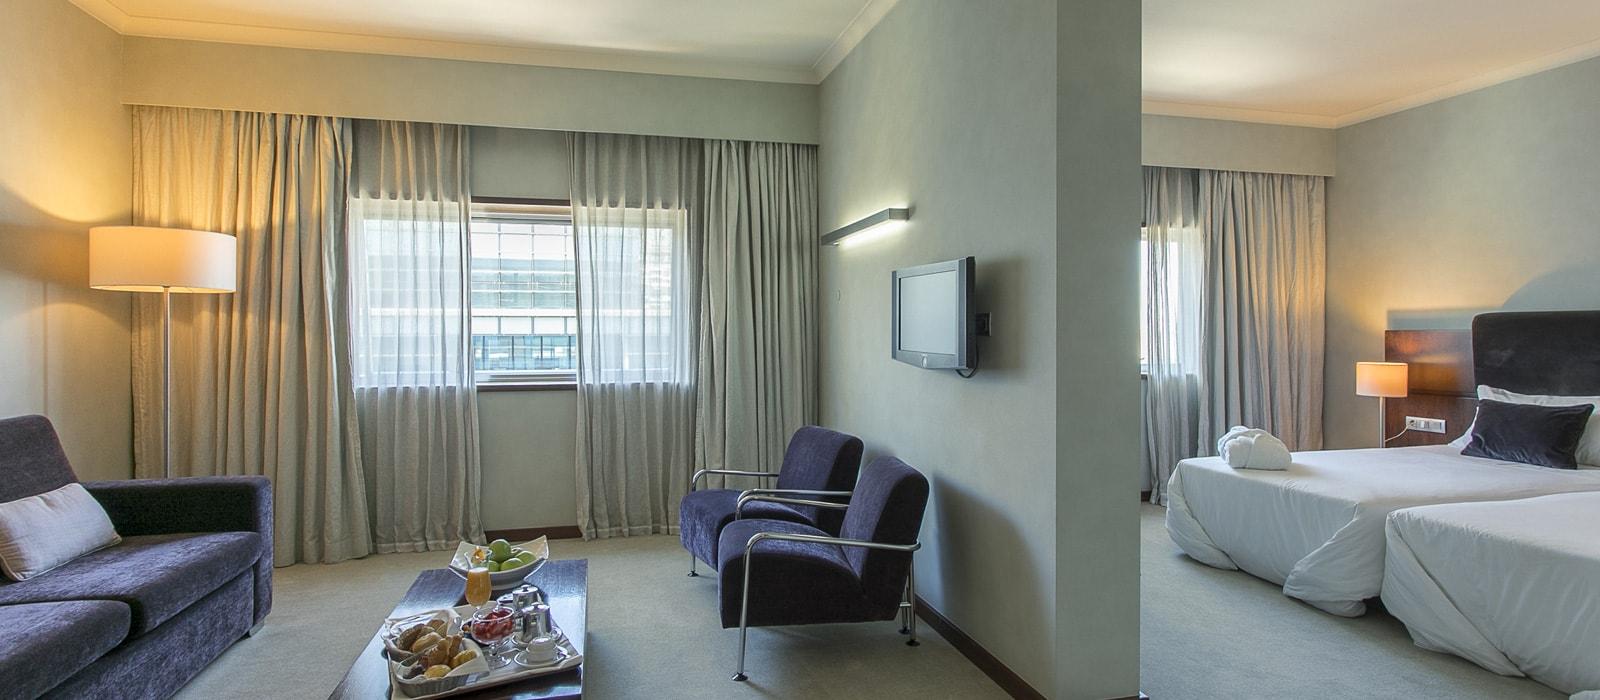 Bedrooms Olissippo Oriente